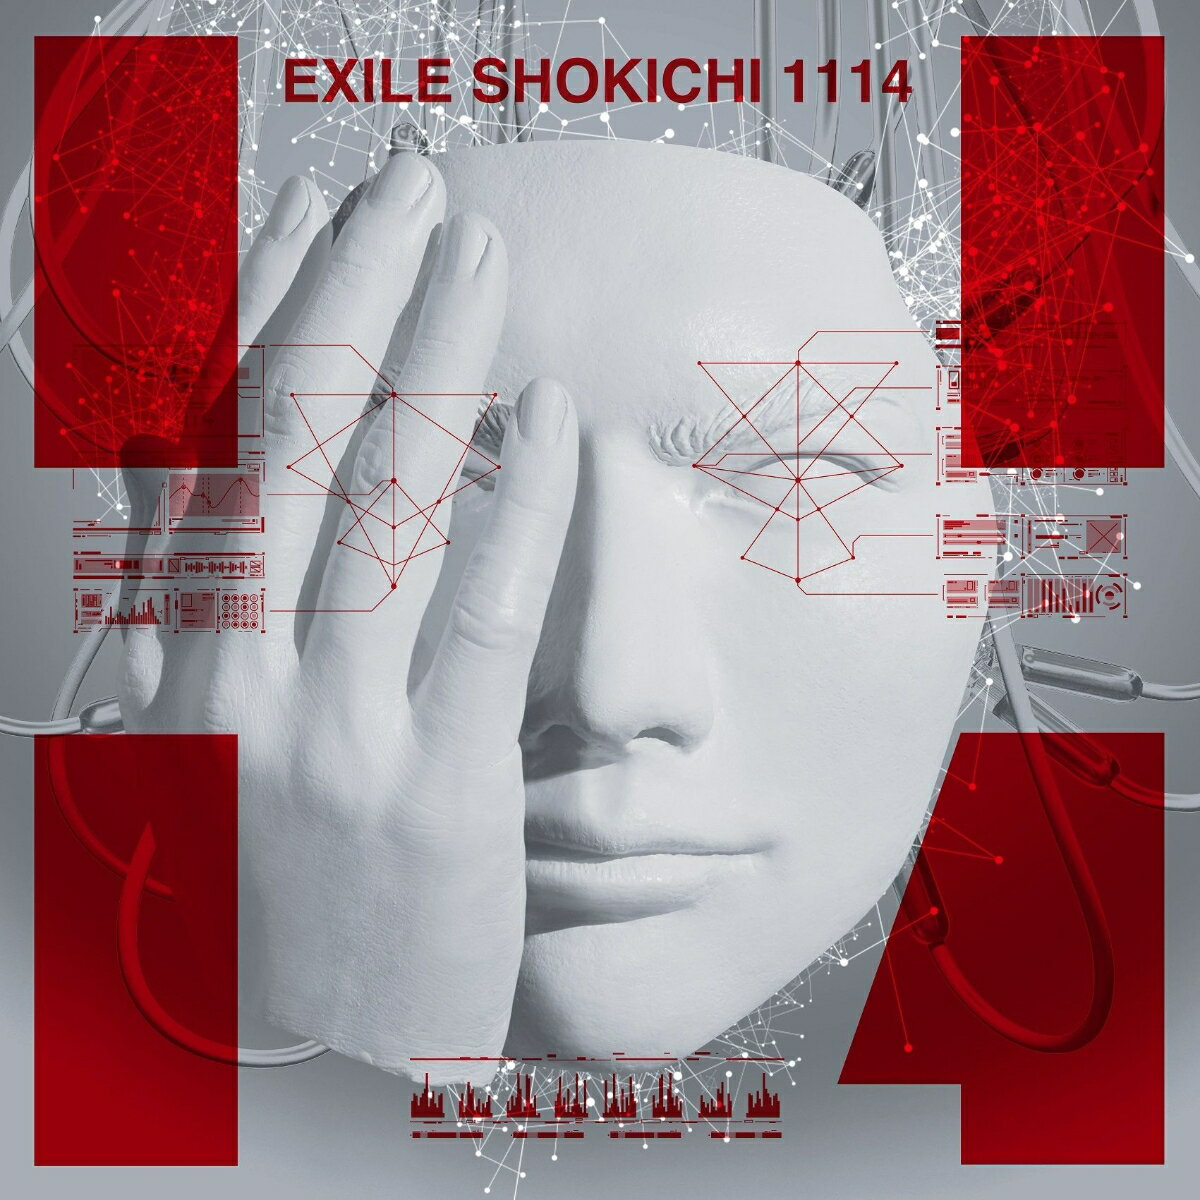 1114 (初回限定盤 CD+DVD) [ EXILE SHOKICHI ]